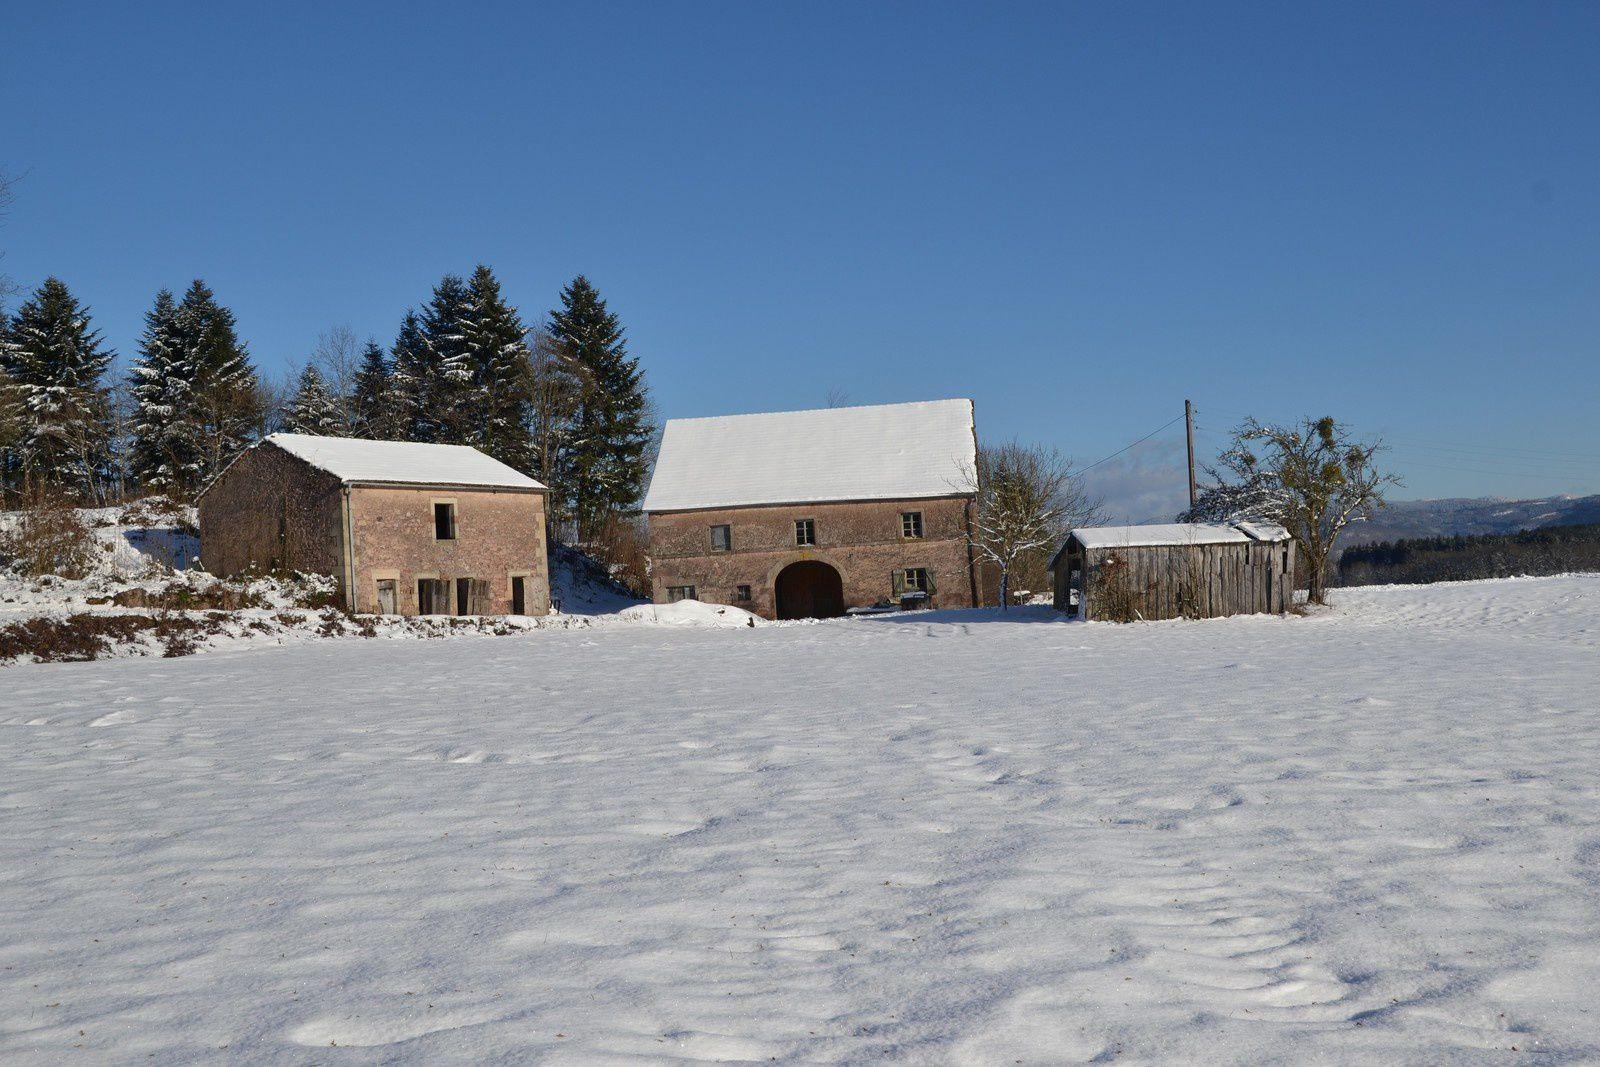 Hiver à Ecromagny -  Haute-Saône